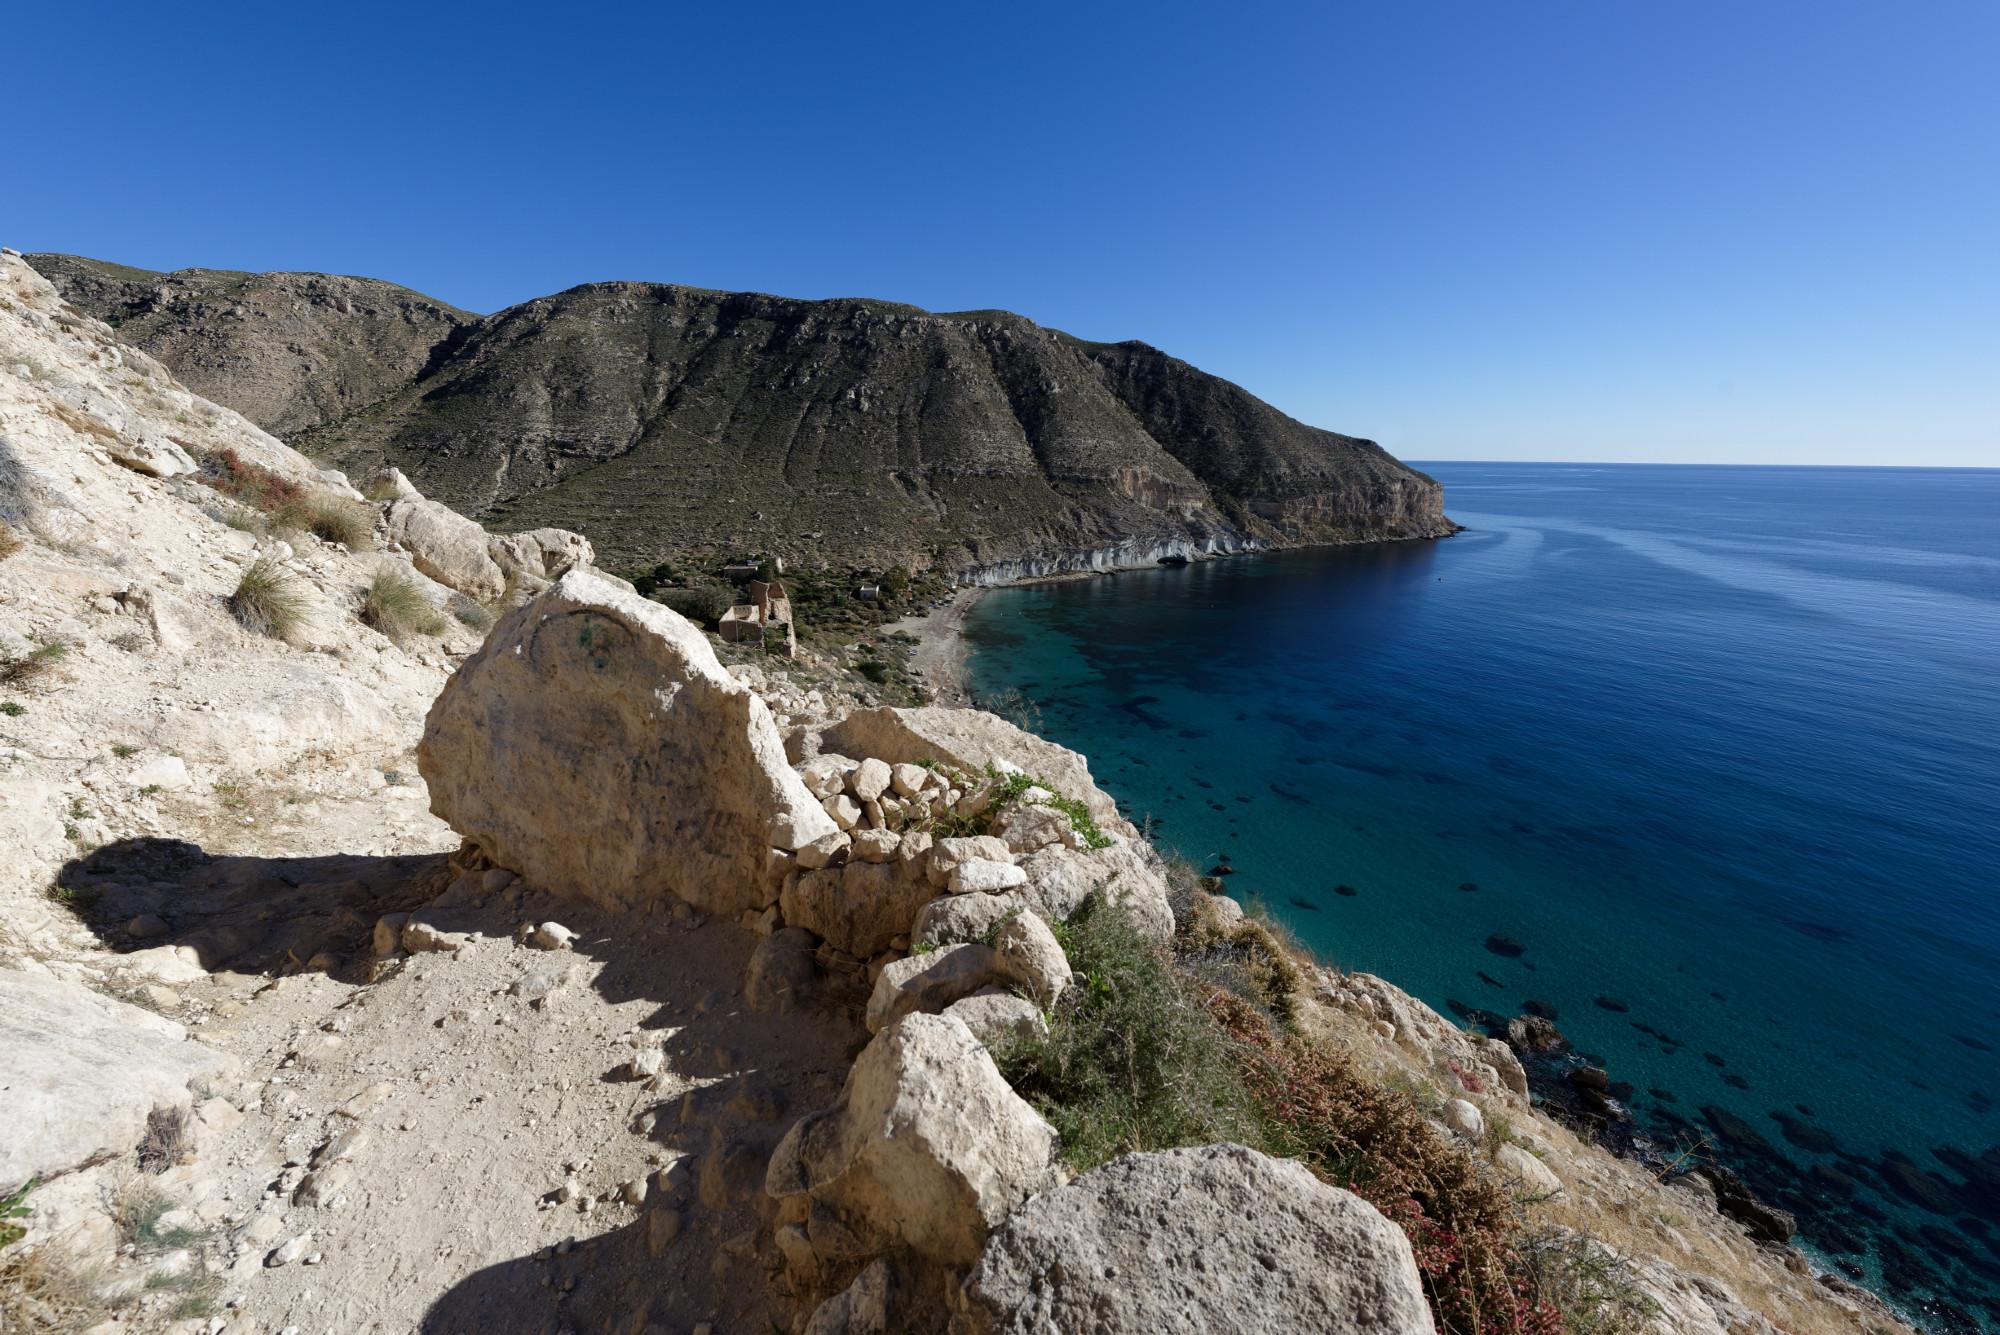 171213-Marche Las Negras-Cala San Pedro-Las Negras (42) (Cabo de Gata-Andalousie)